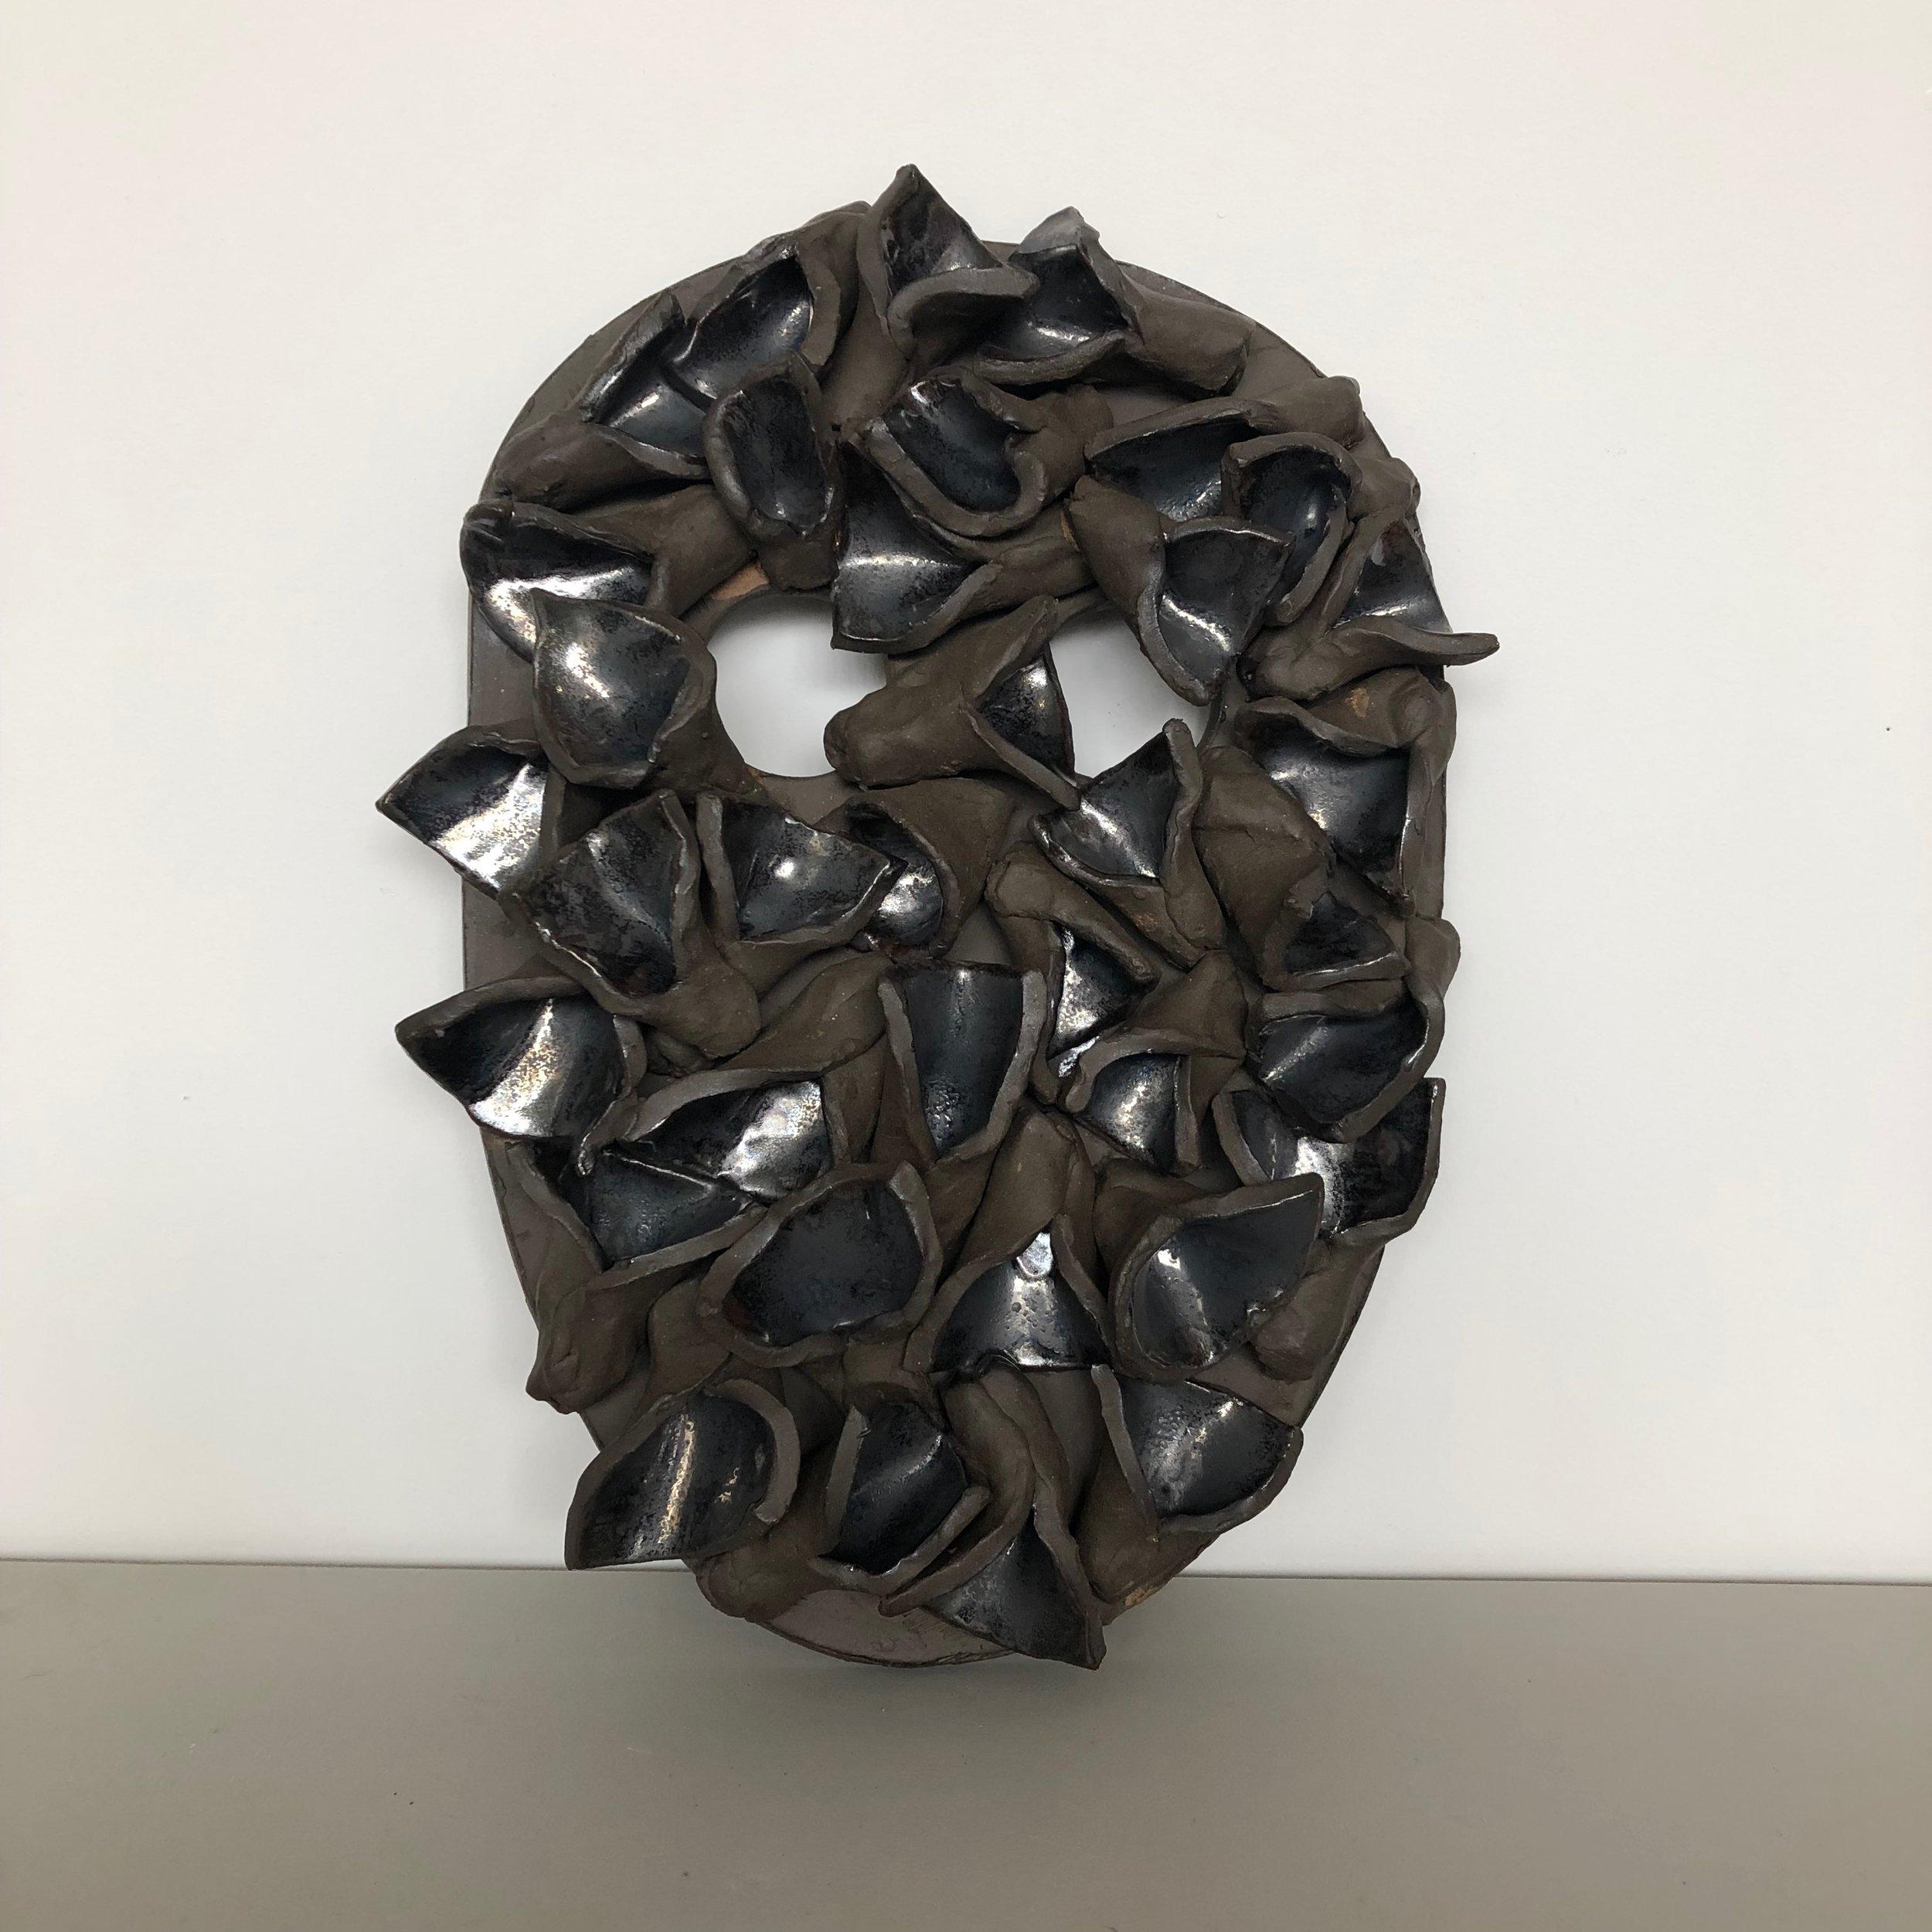 Untitled, 2019, glazed ceramic, 12 1/2 x 9 1/2 x 2 inches